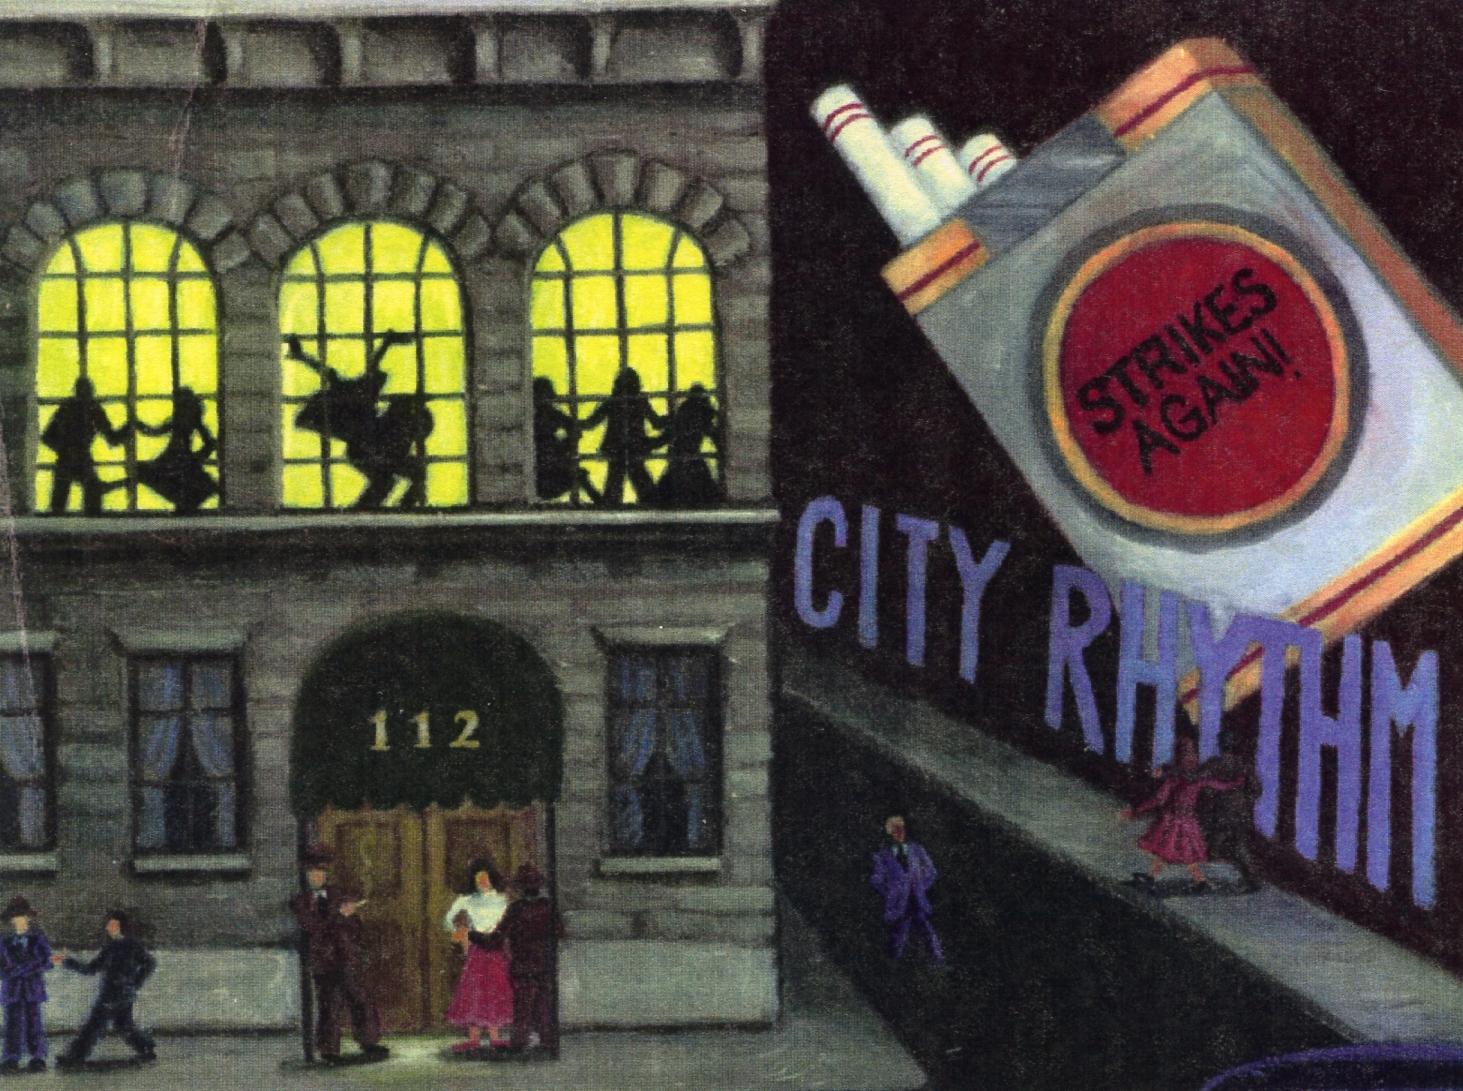 City Rhythm Strikes Again Release Party